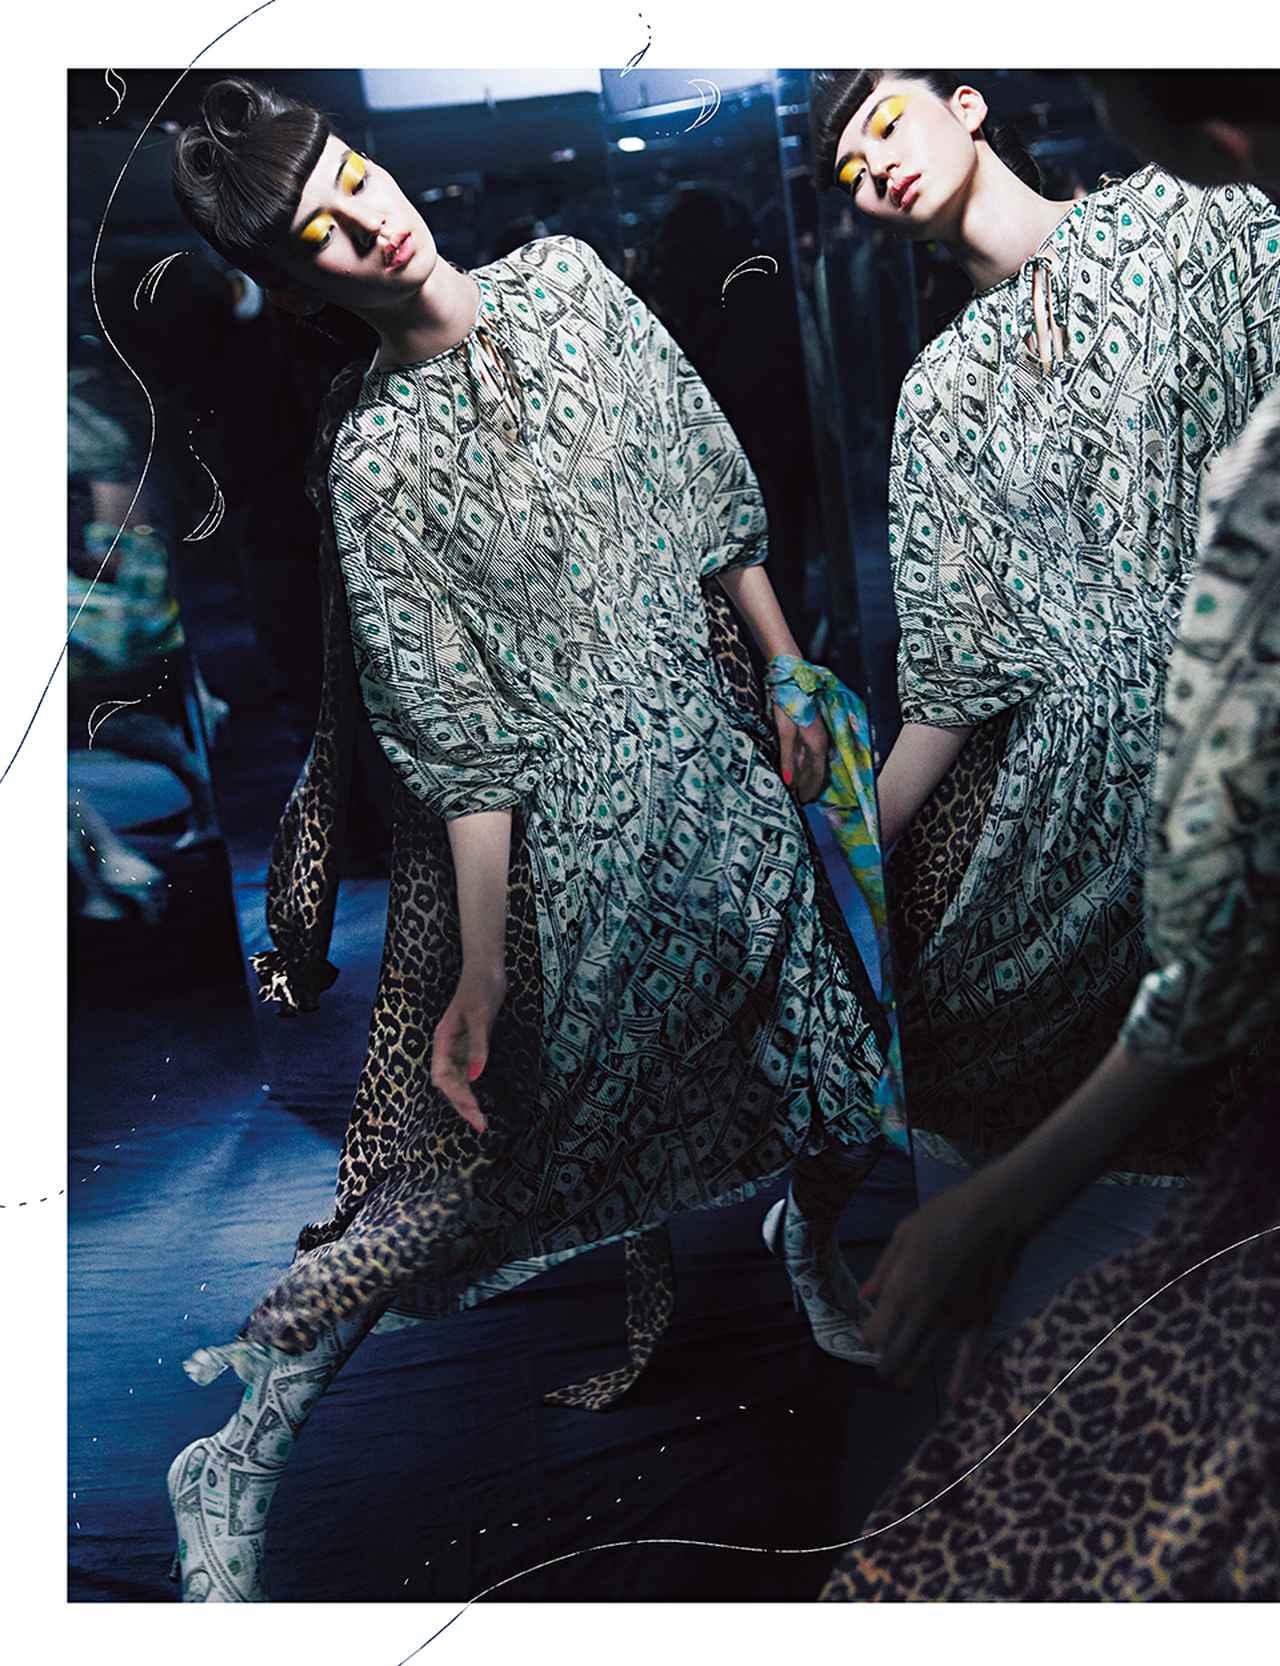 Images : 3番目の画像 - 「ファッションは愉快だ!」のアルバム - T JAPAN:The New York Times Style Magazine 公式サイト